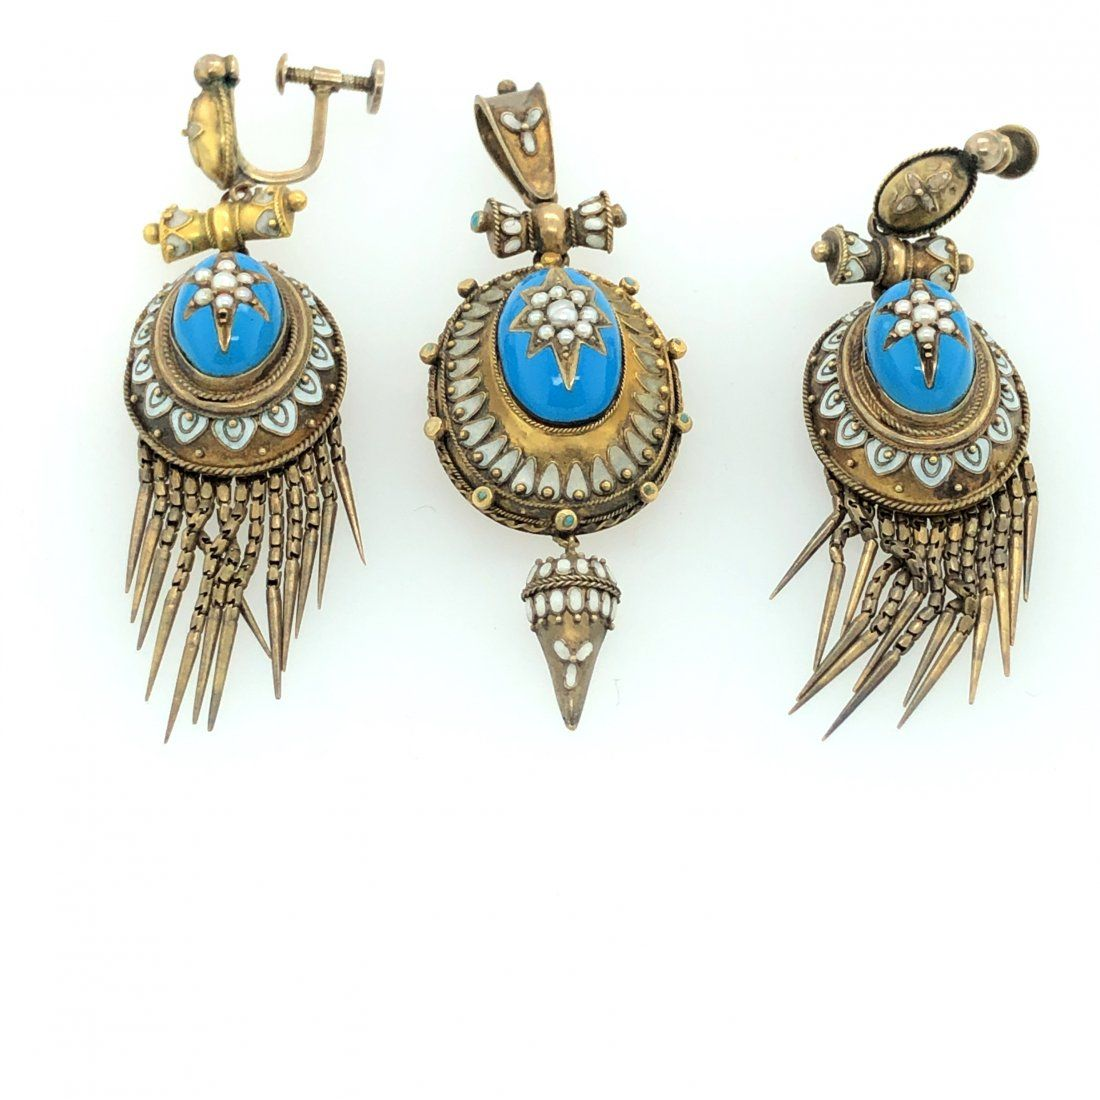 15k yellow gold. Earrings and pendant enamel set